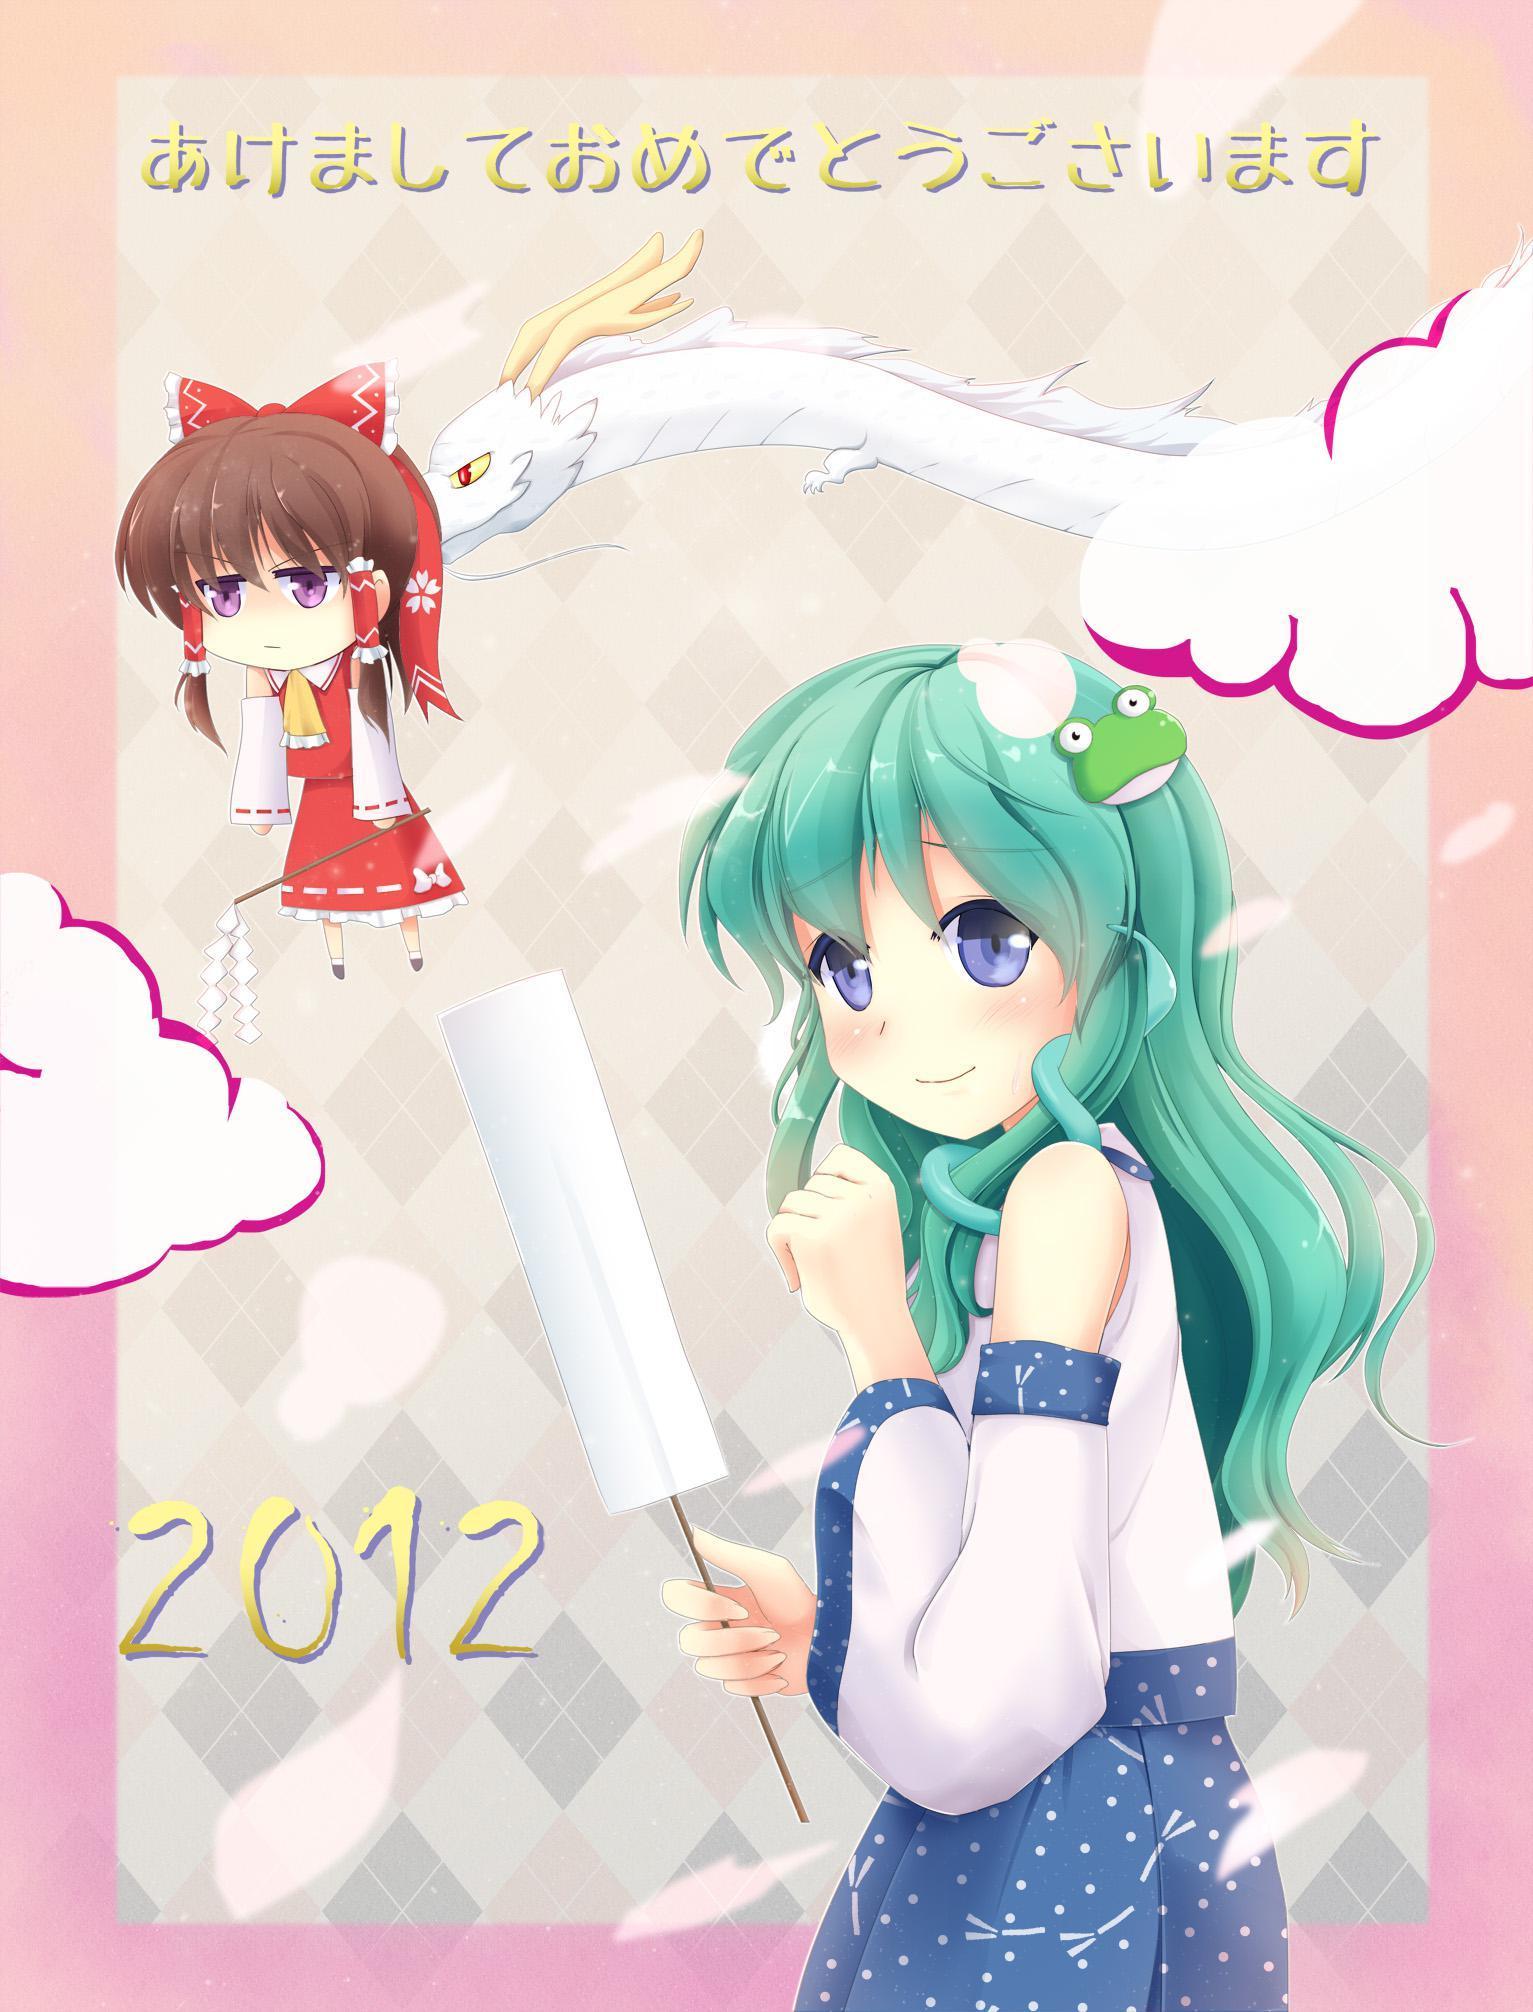 P站画师作品新年快乐